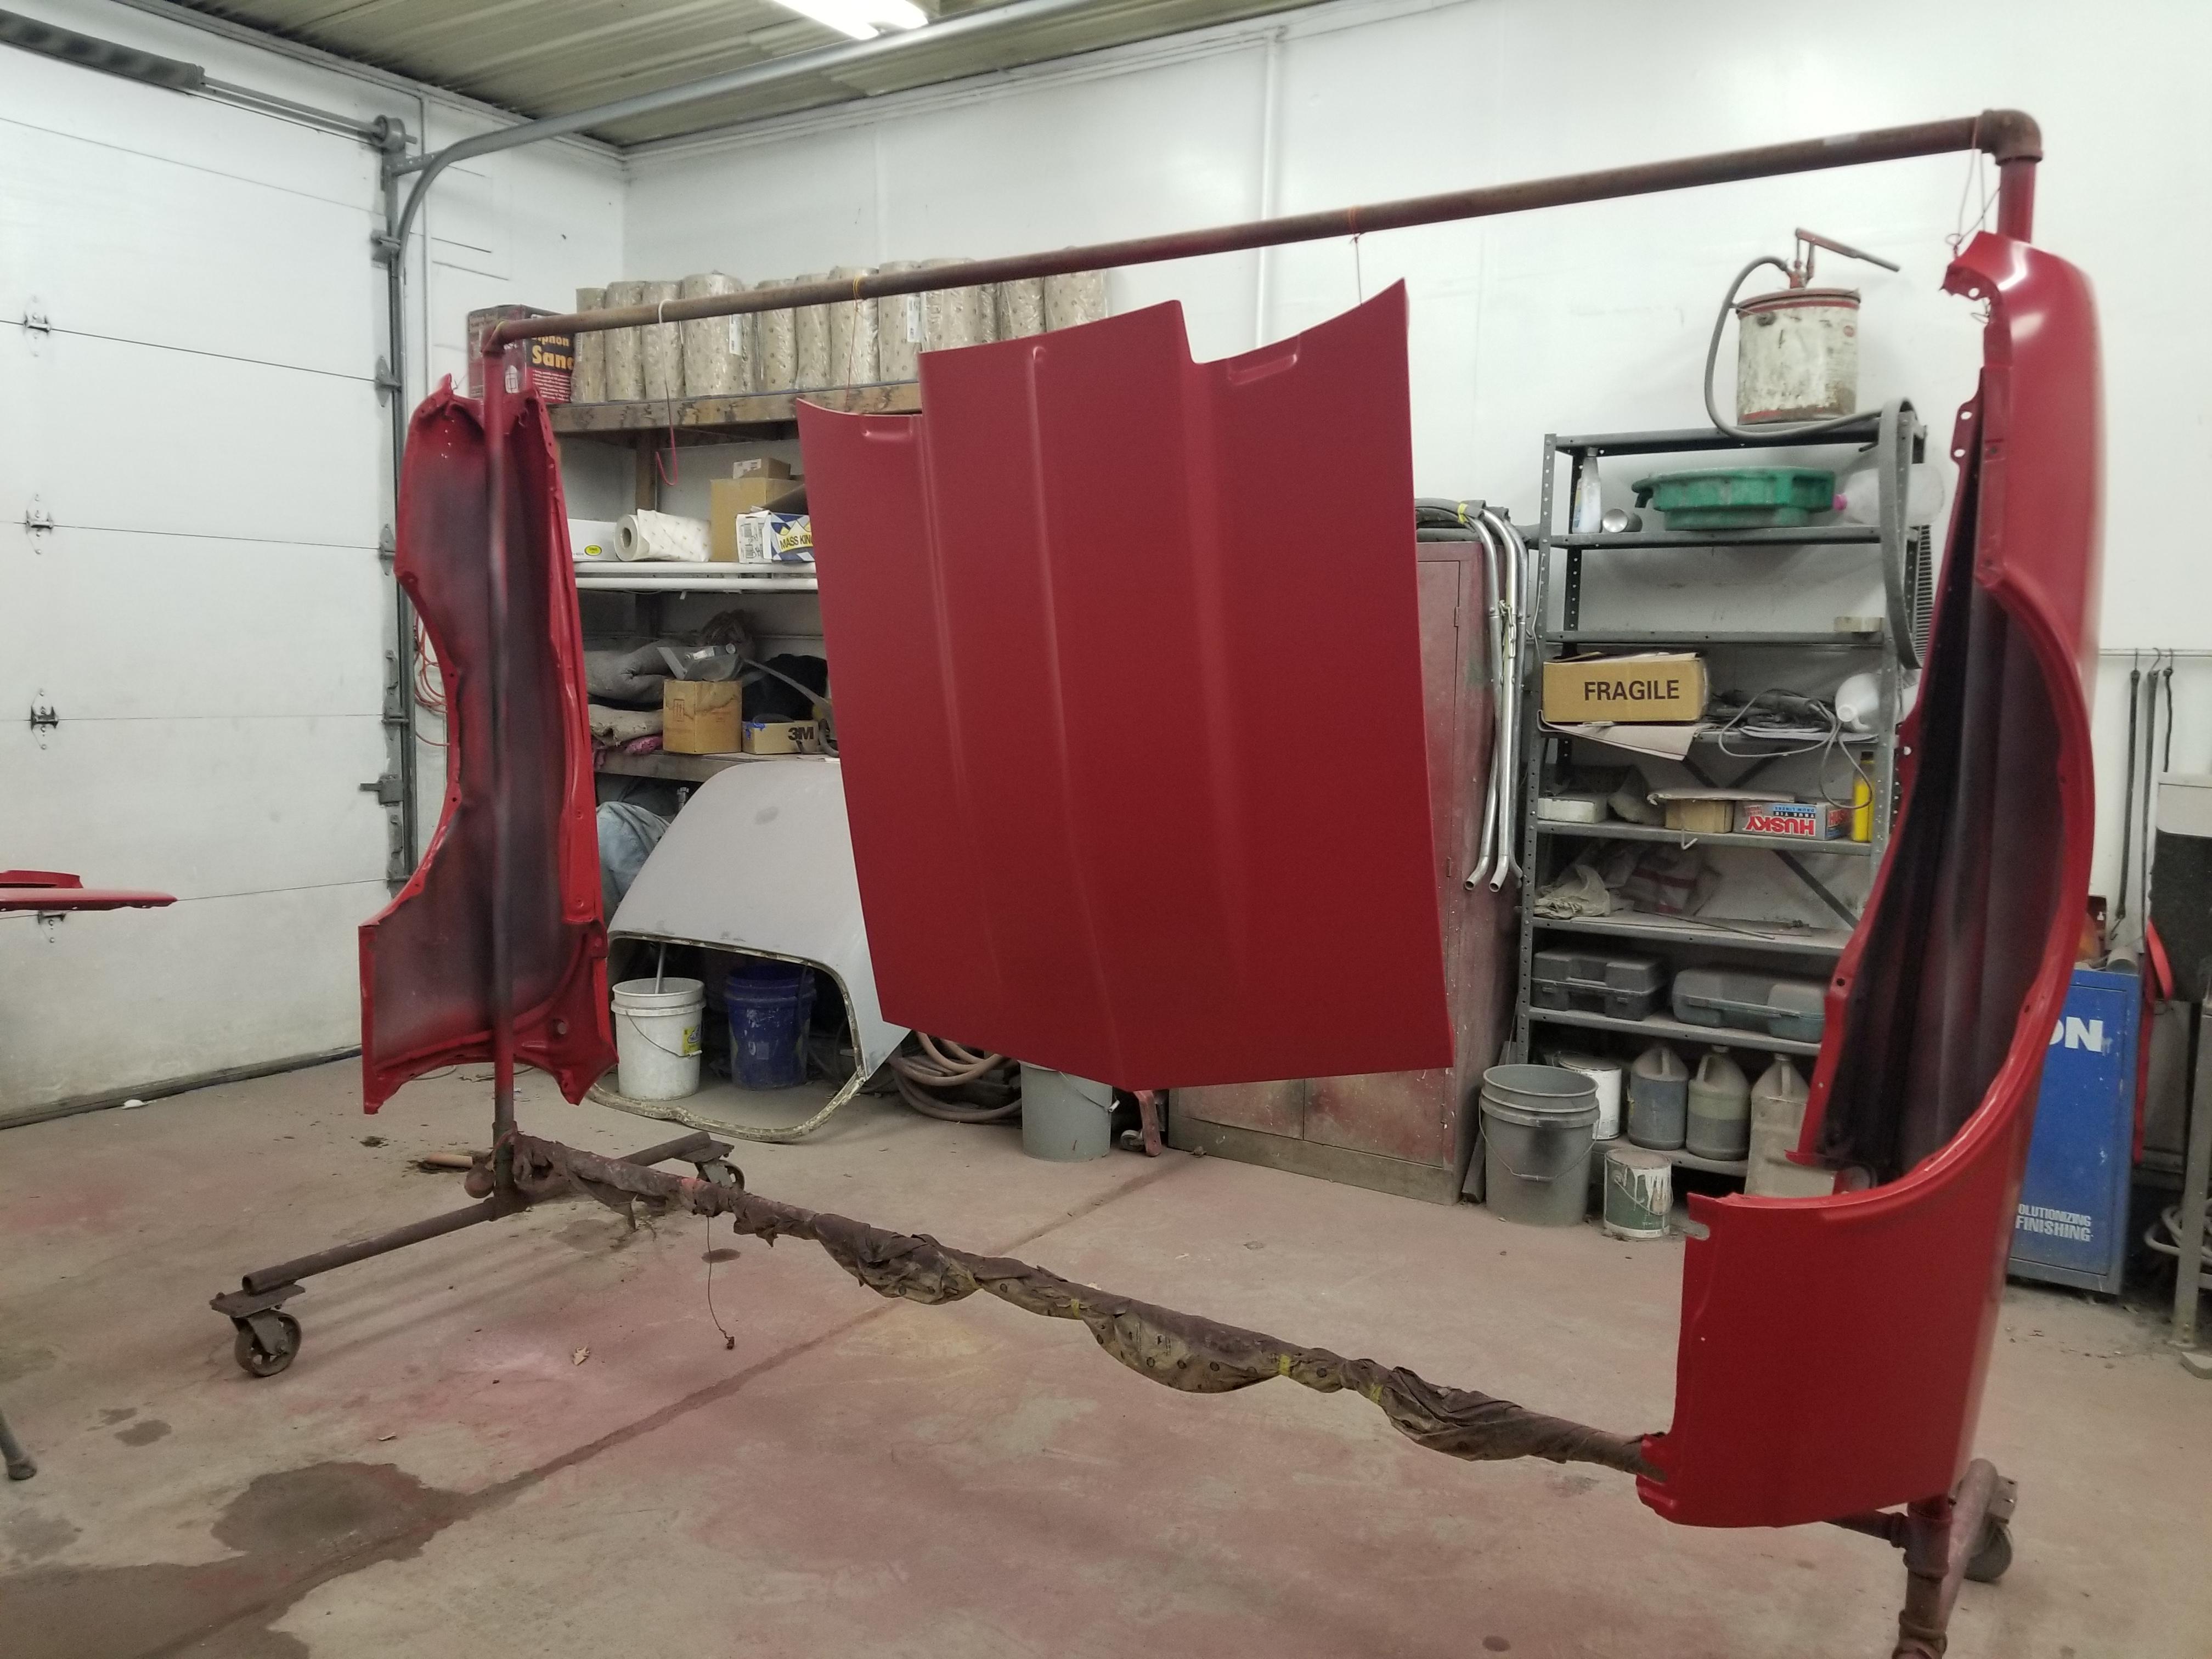 67 Camaro Restoration